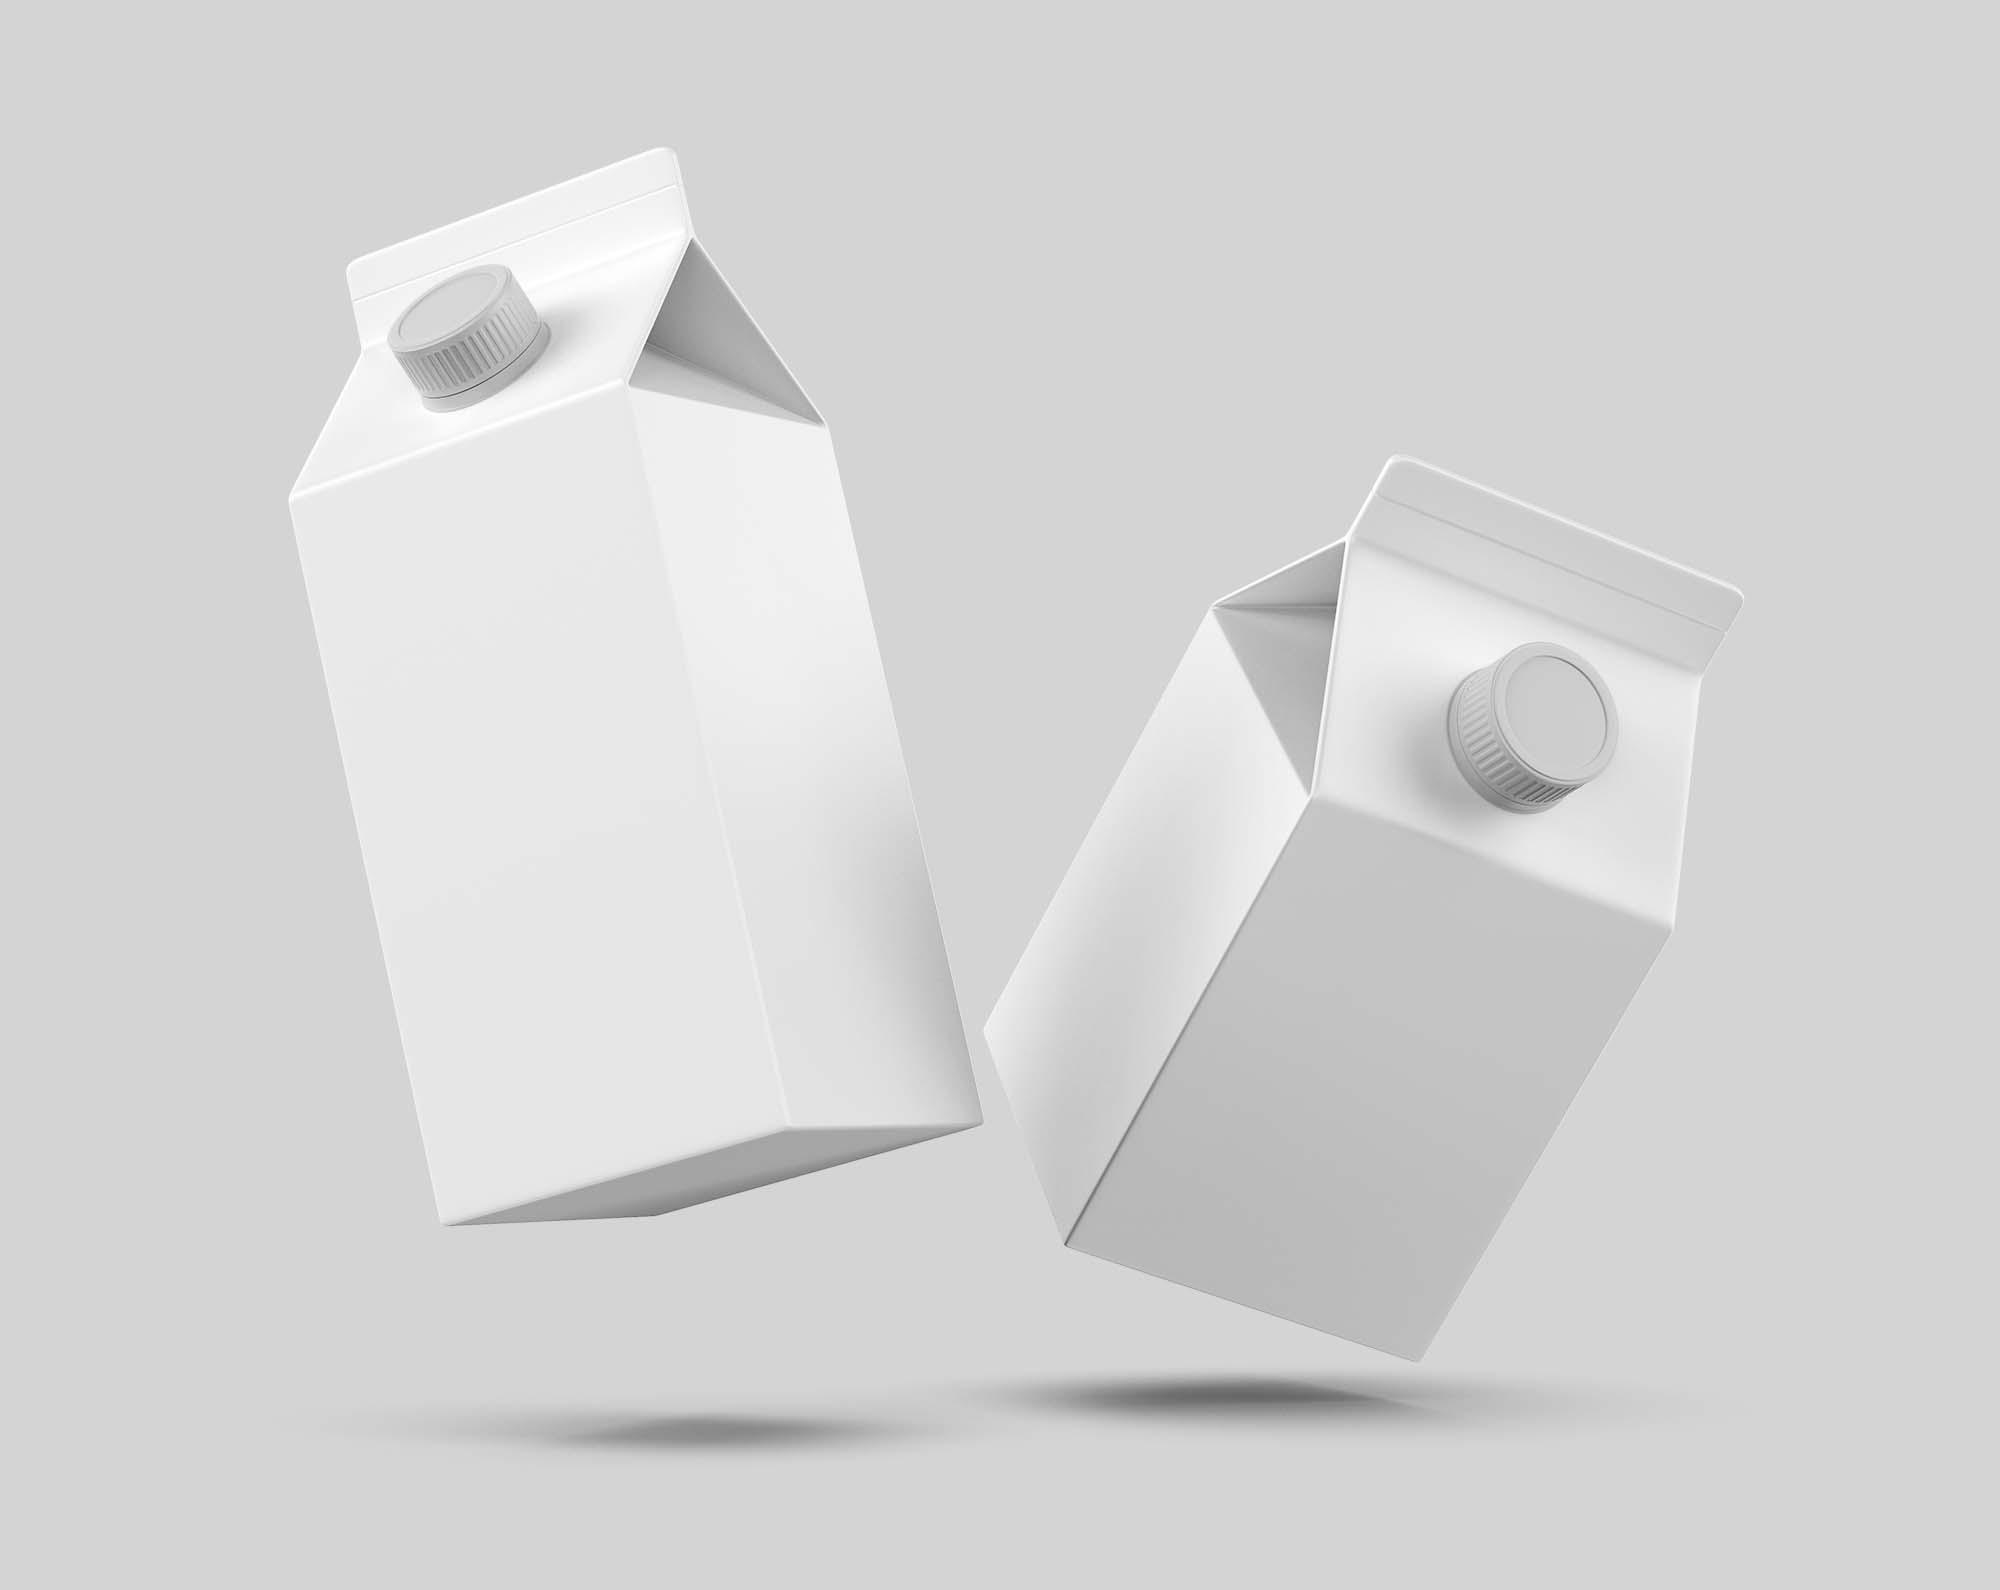 Flying Milk Carton Packing Mockup 2